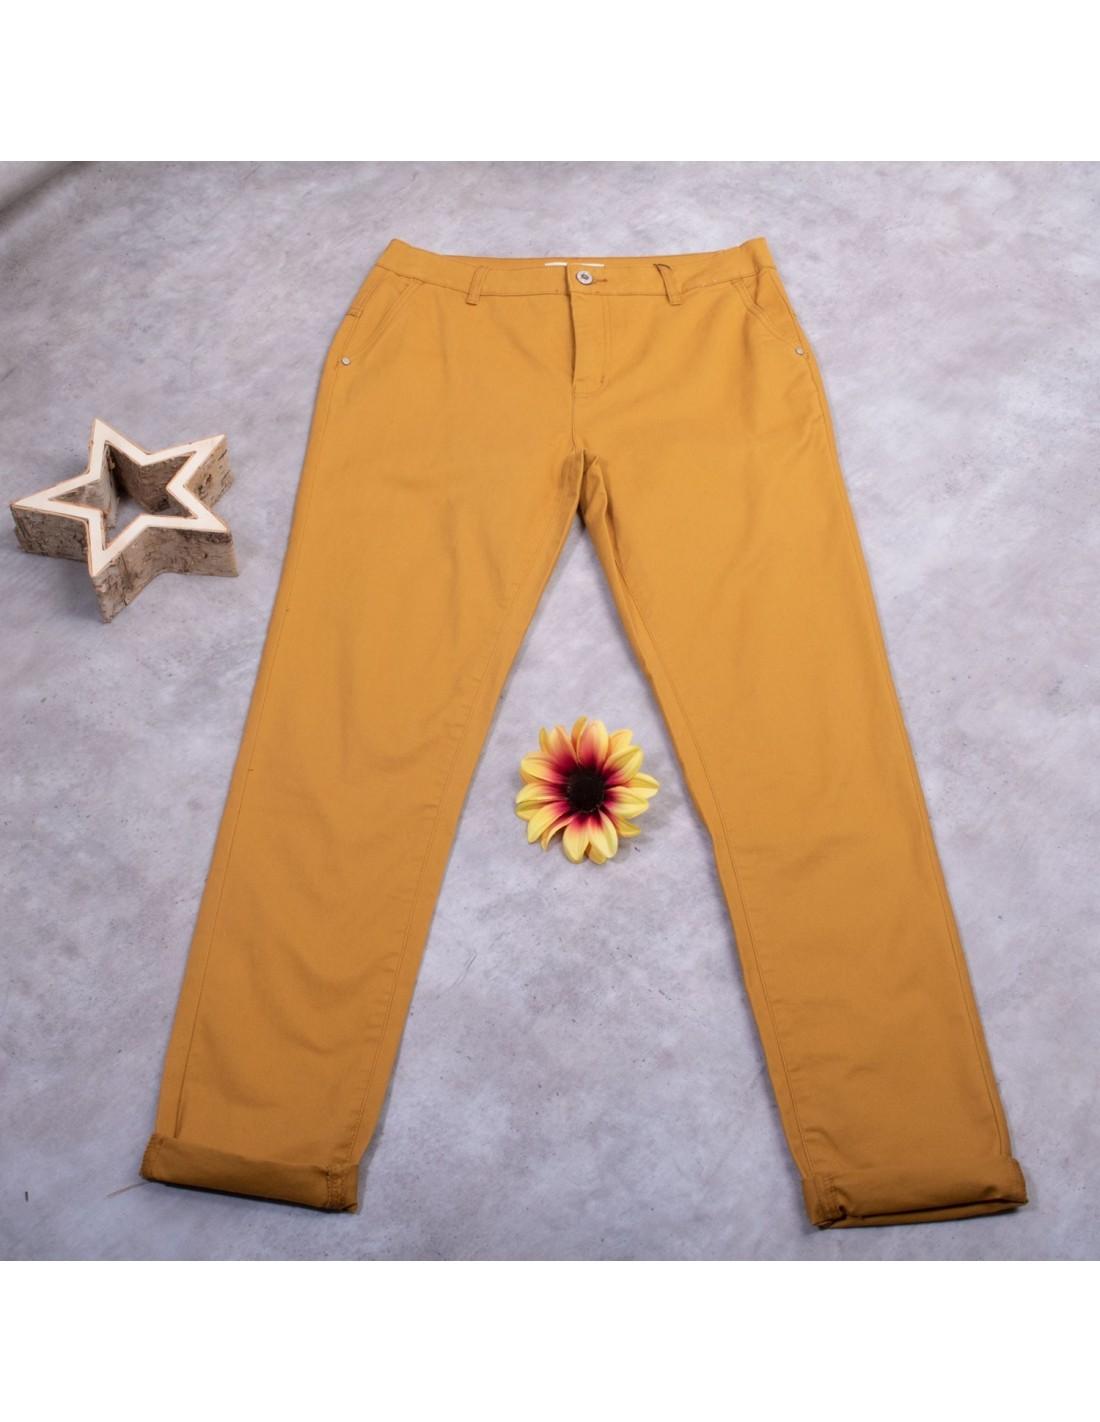 Pantalon chino femme coupe droite taille haute jaune moutarde 36 au 44